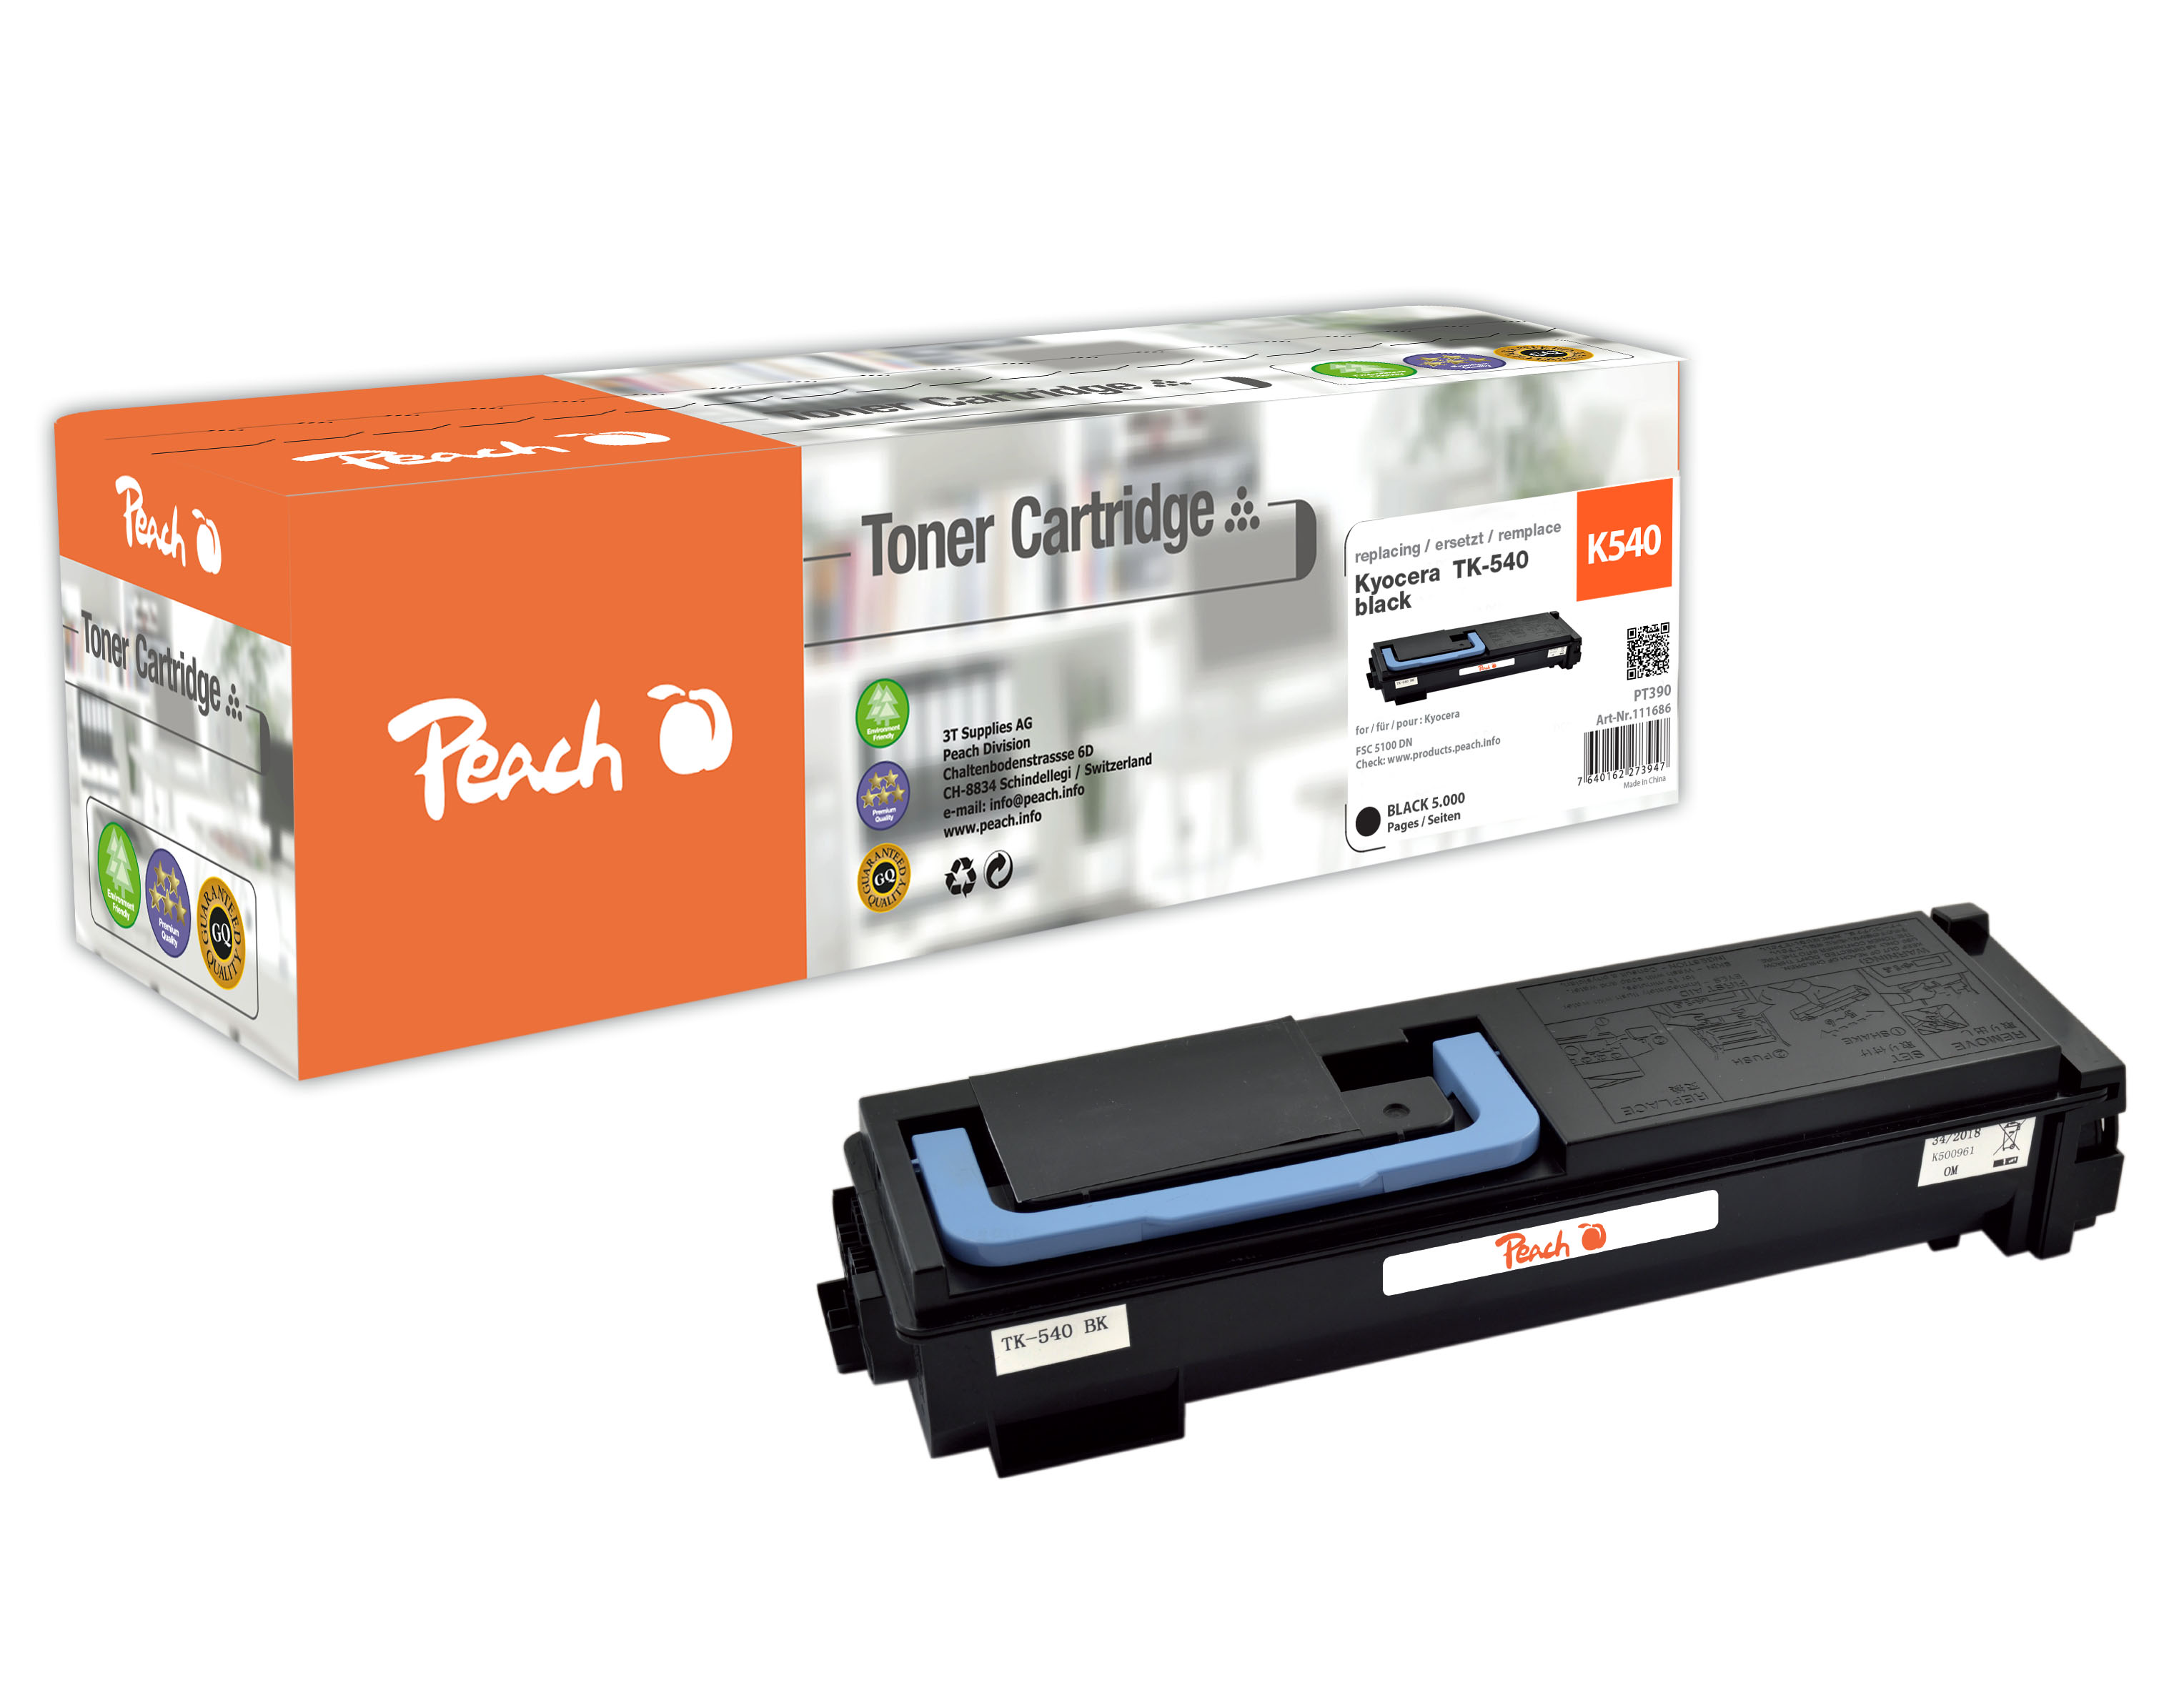 Peach  Tonermodul schwarz kompatibel zu Kyocera FSC 5100 DN